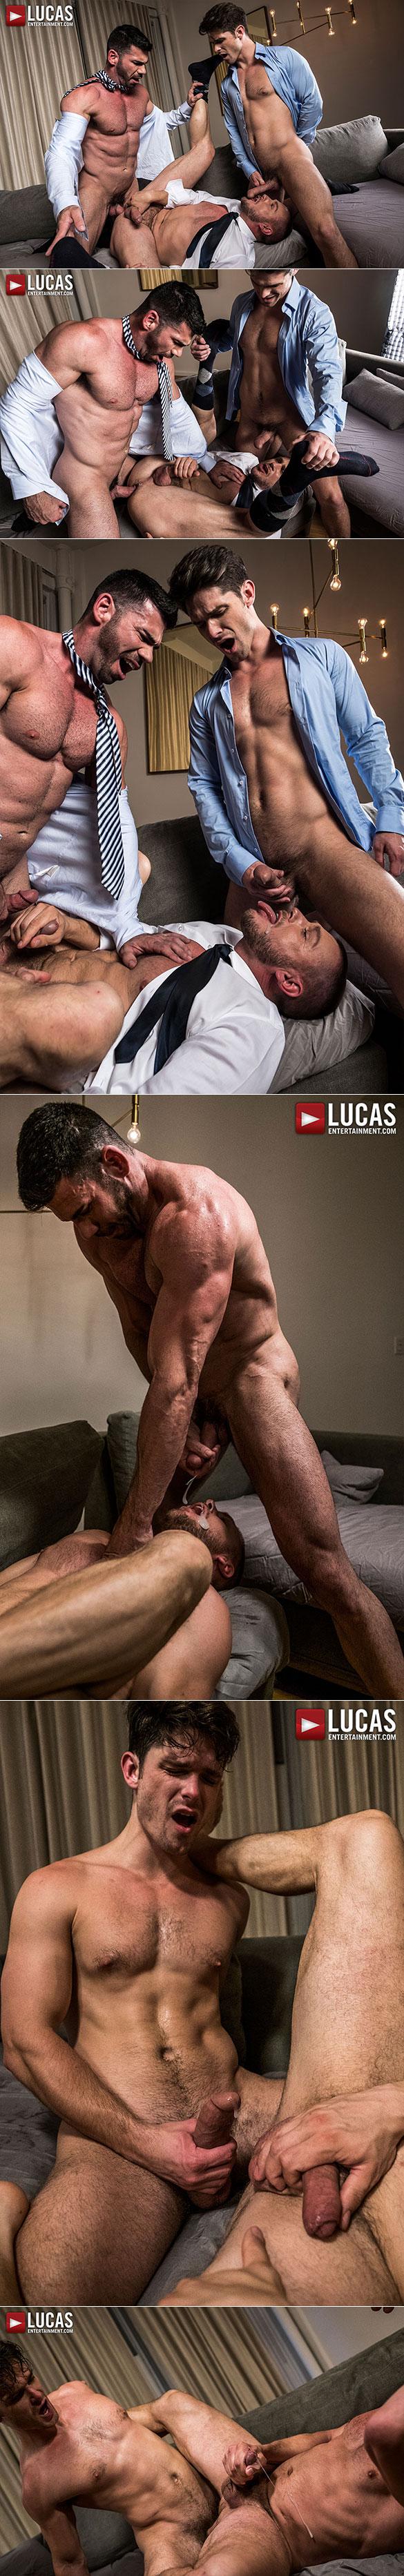 "Lucas Entertainment: Hans Berlin, Billy Santoro and Devin Franco's raw threesome in ""Gentlemen 21: Top Management"""